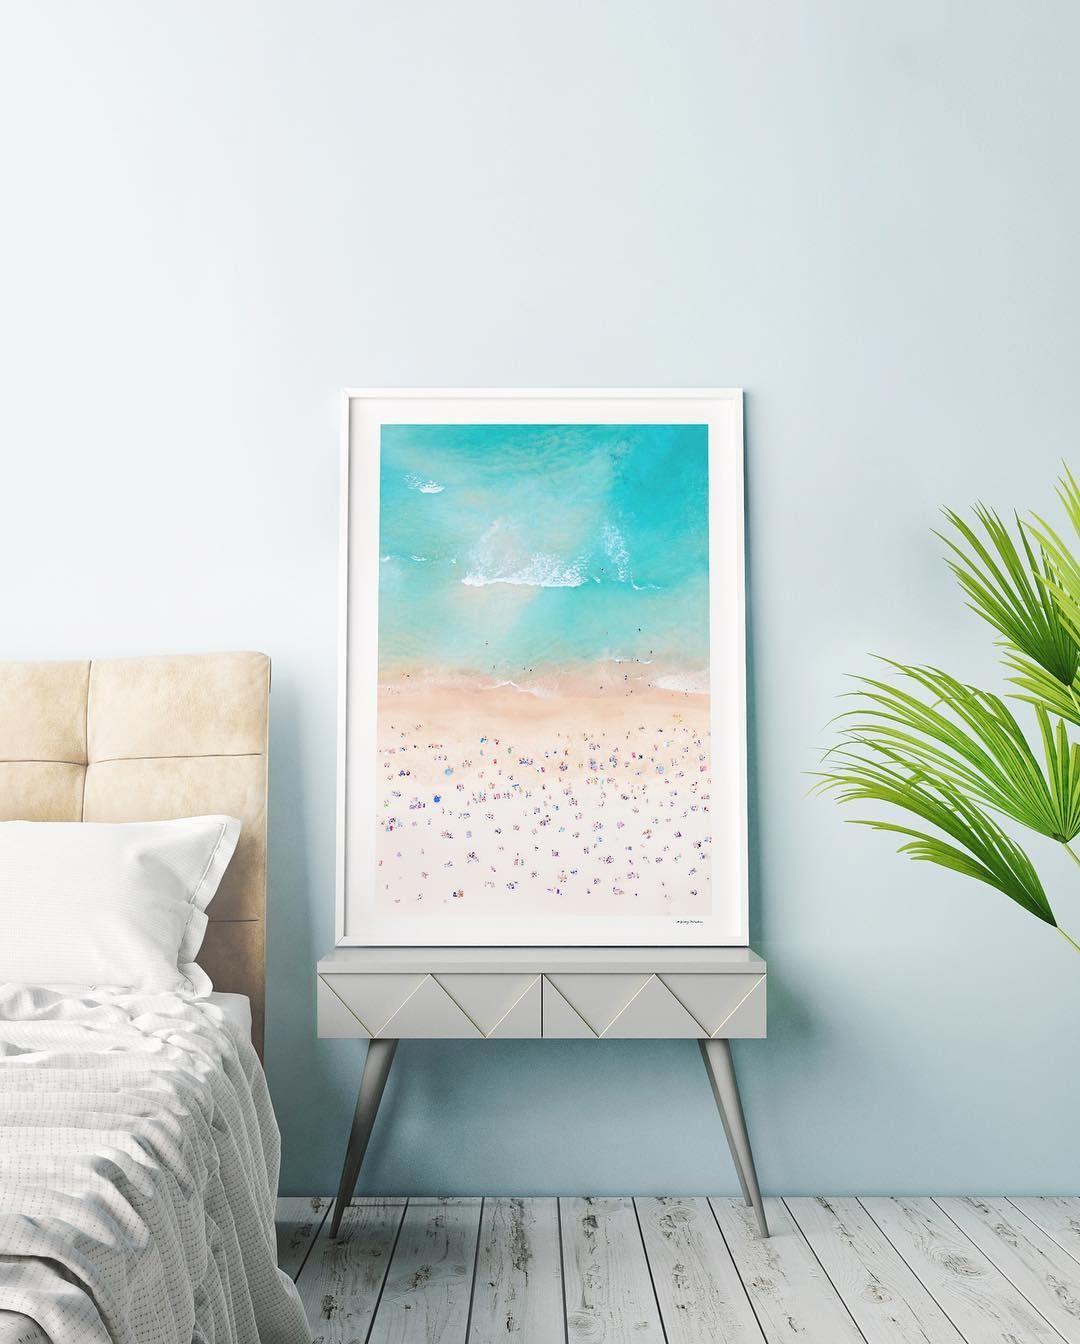 11 8k Likes 28 Comments Pantone Pantone On Instagram Wake Up To The Serene Colors Of Bondi Beach C Gray Ma Modern Beach Decor Coastal Wall Decor Decor